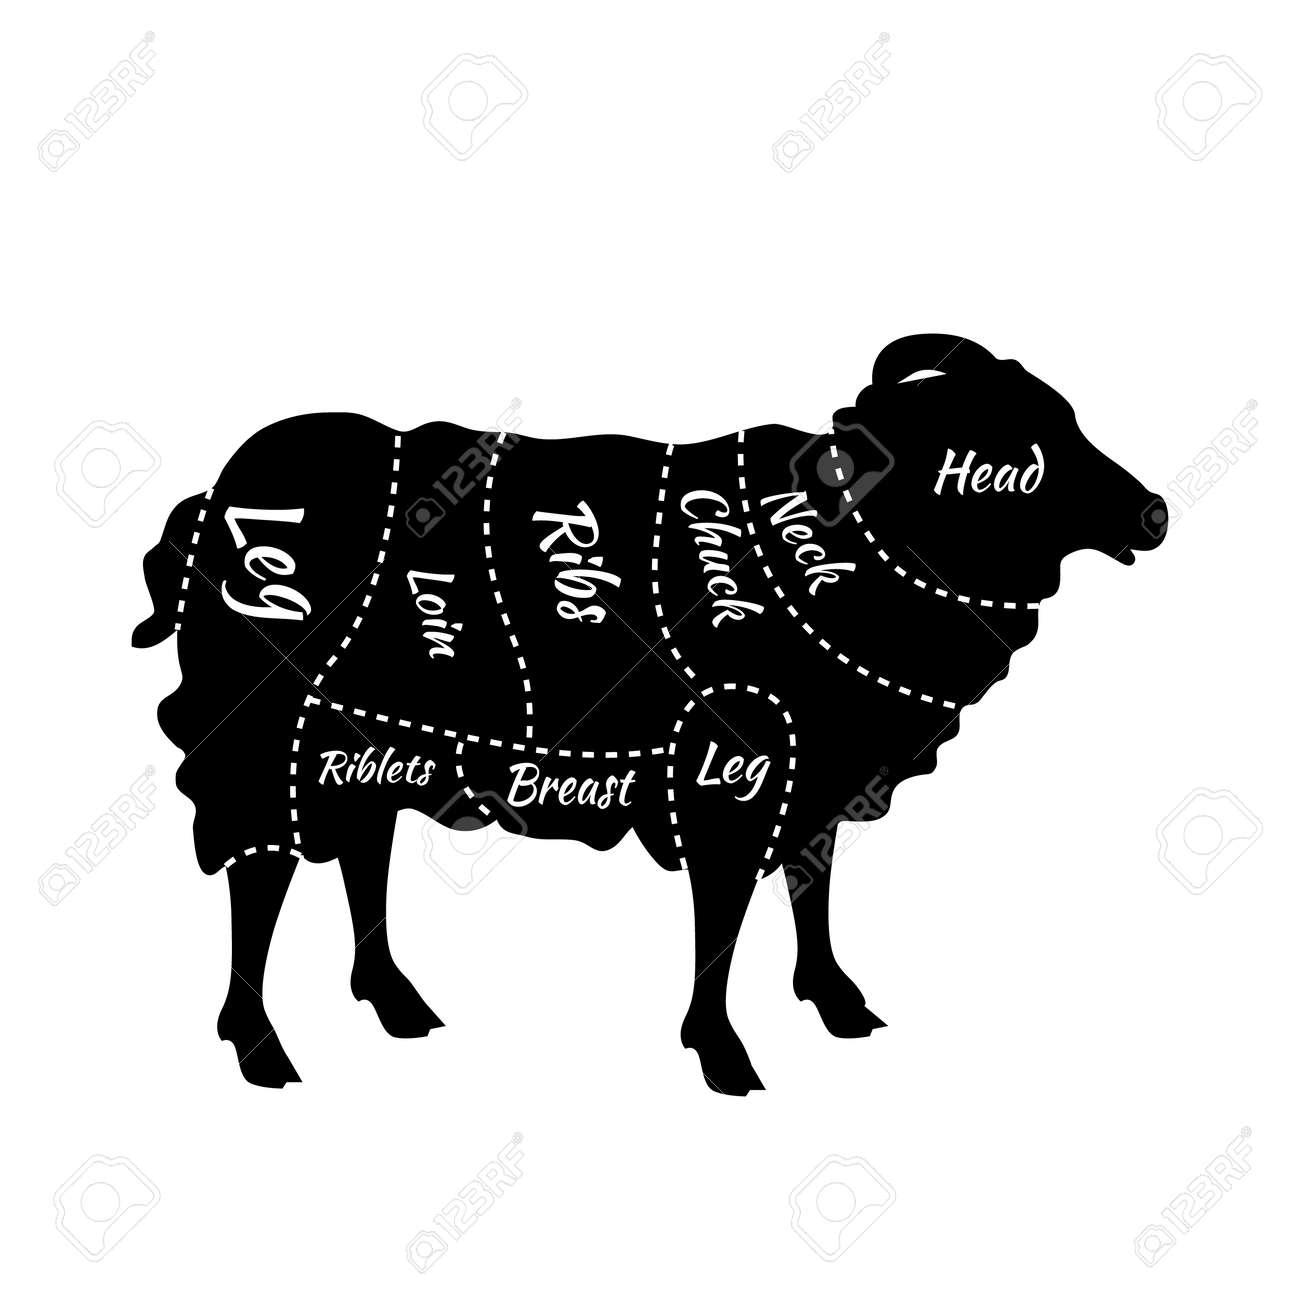 cuts of lamb  british cuts of lamb or mutton diagram  butcher cuts scheme  of lamb  lamb or mutton cuts diagram  detailed diagram, scheme or chart of  english